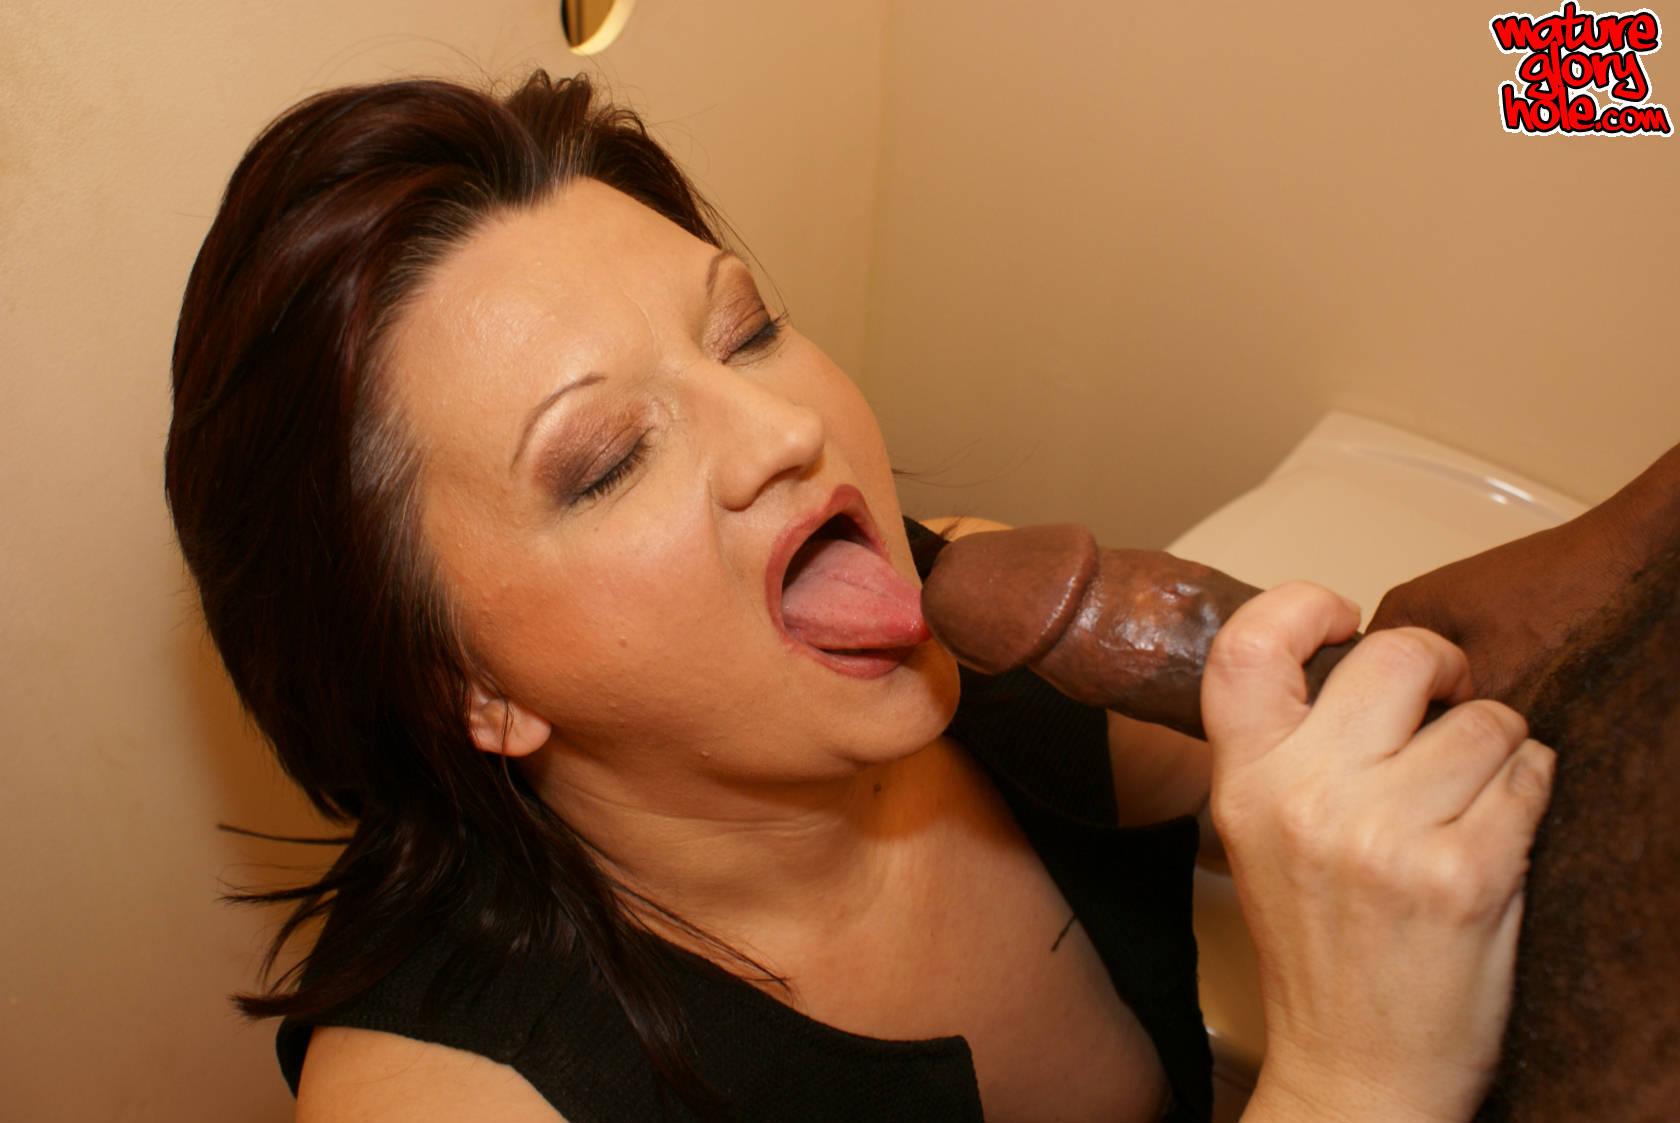 Most erotic fantasy